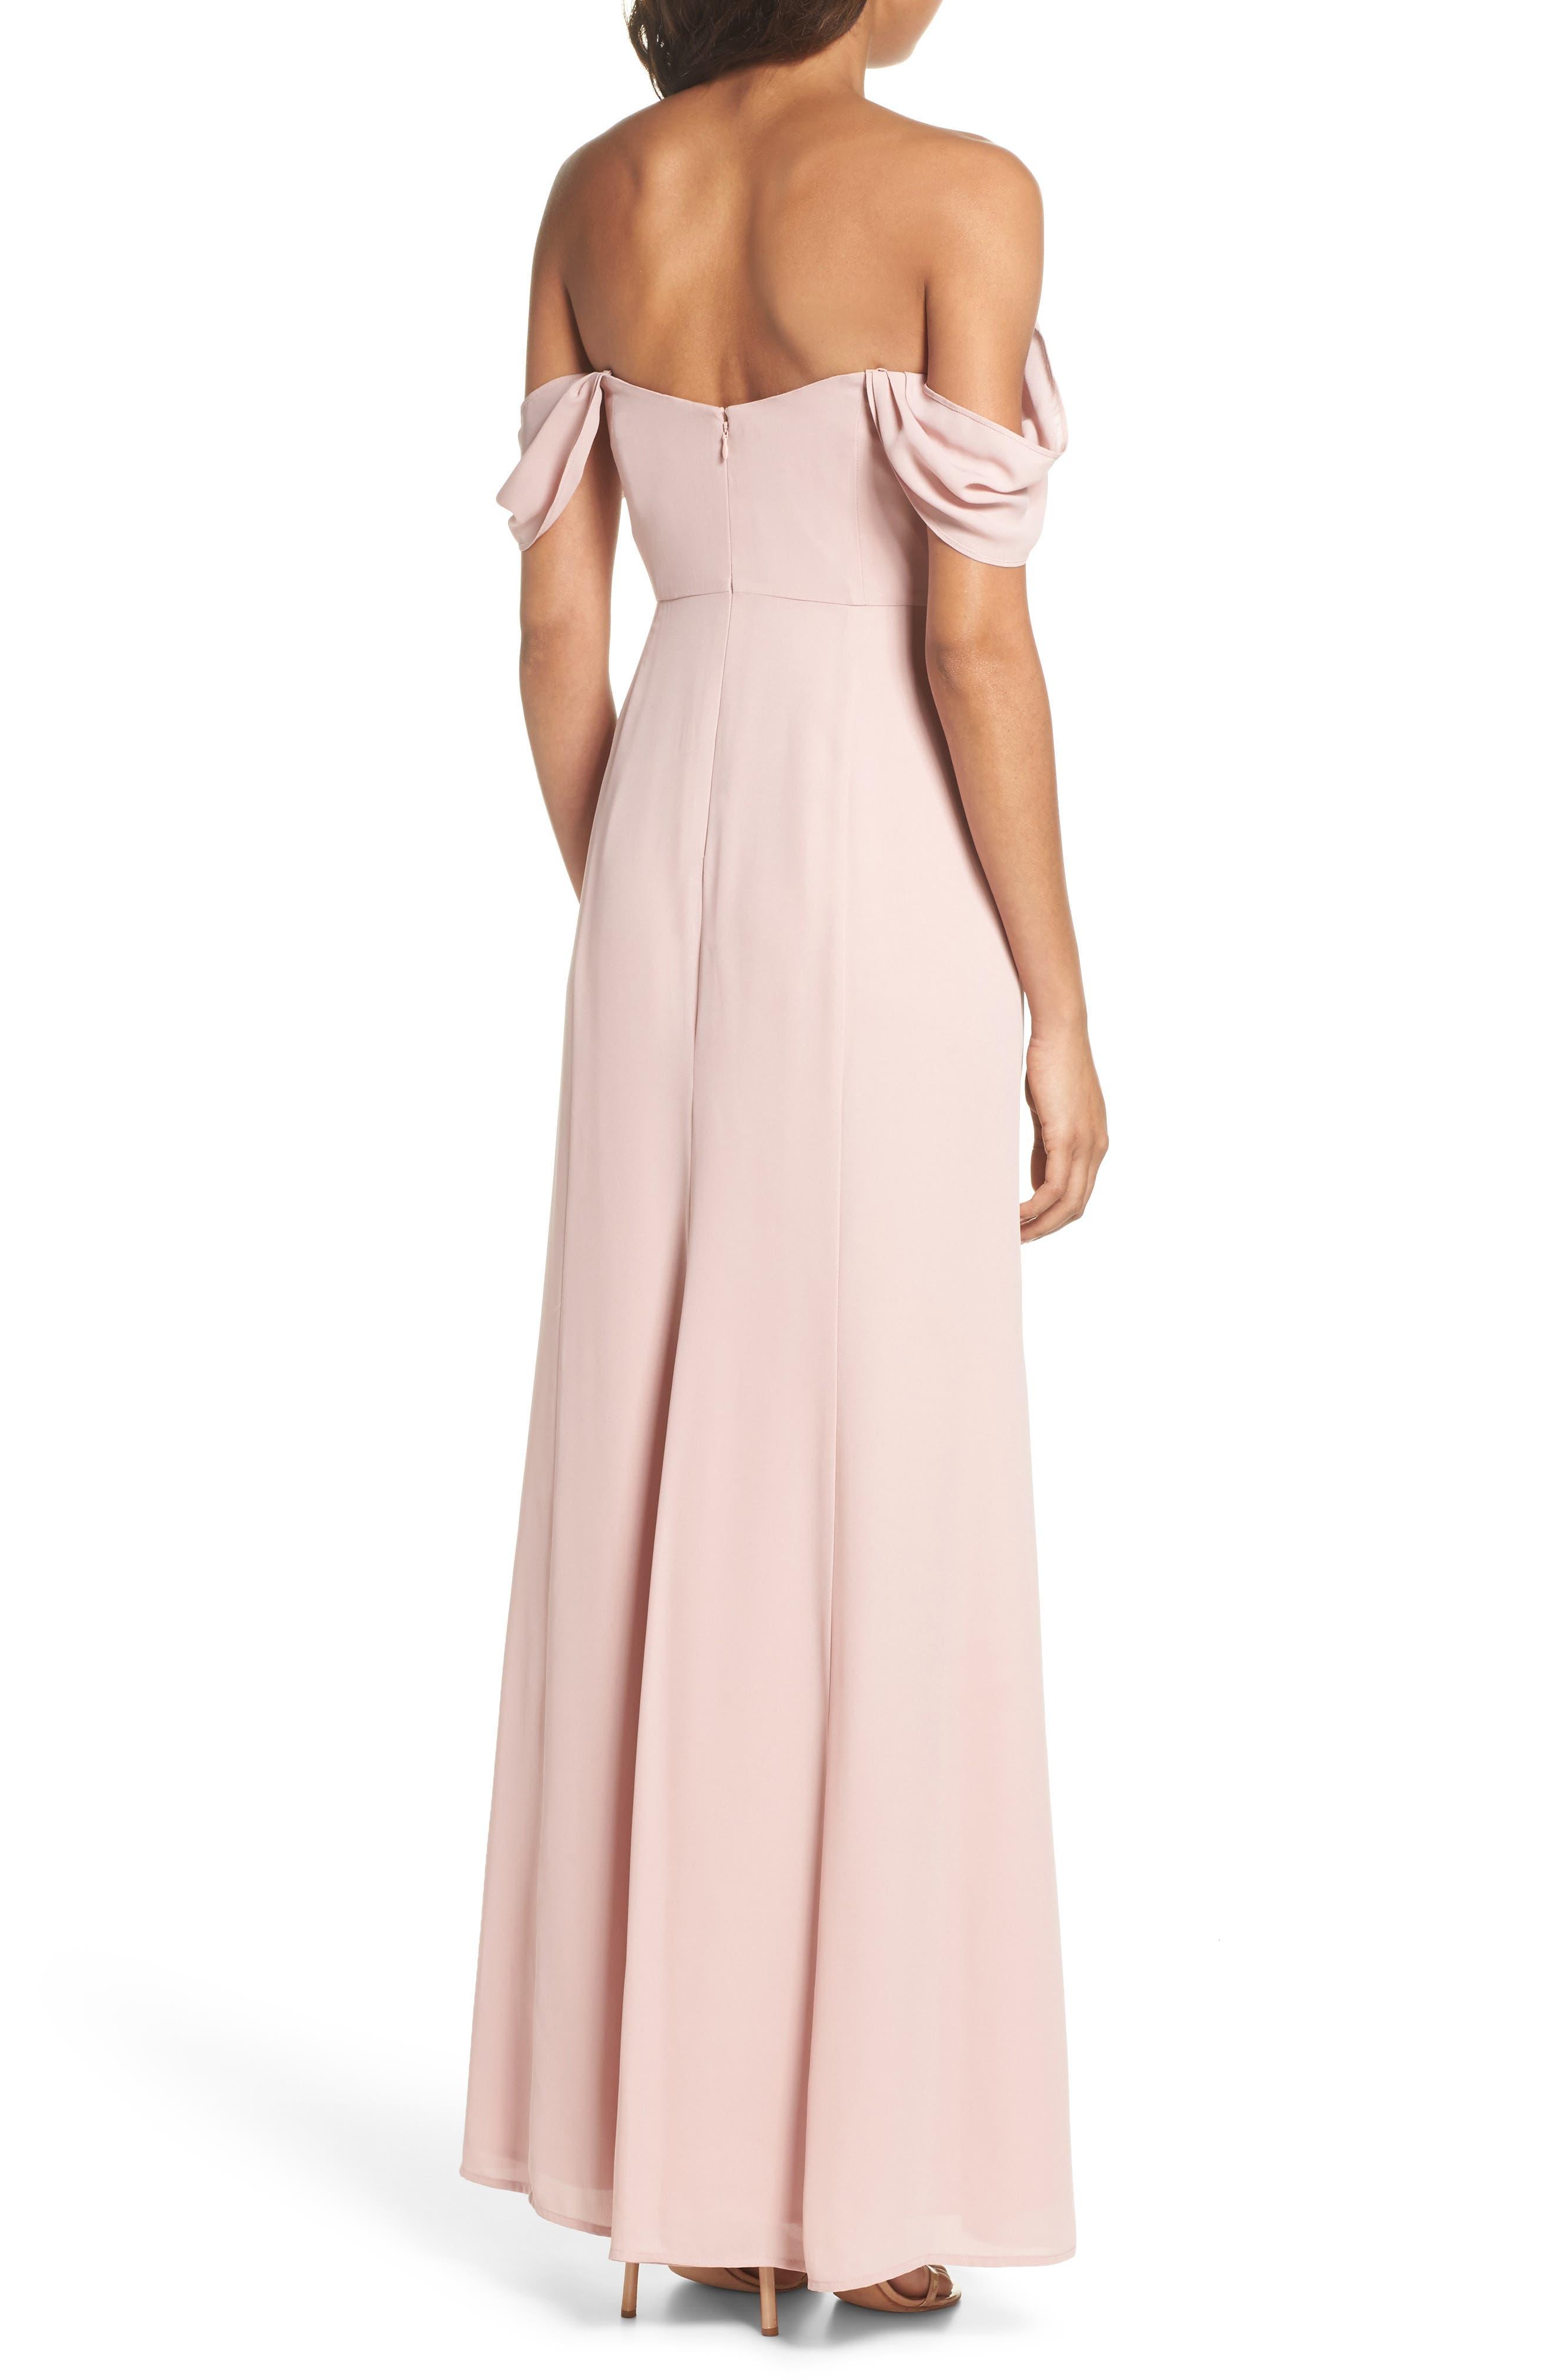 Rachel Off the Shoulder Gored Maxi Dress,                             Alternate thumbnail 4, color,